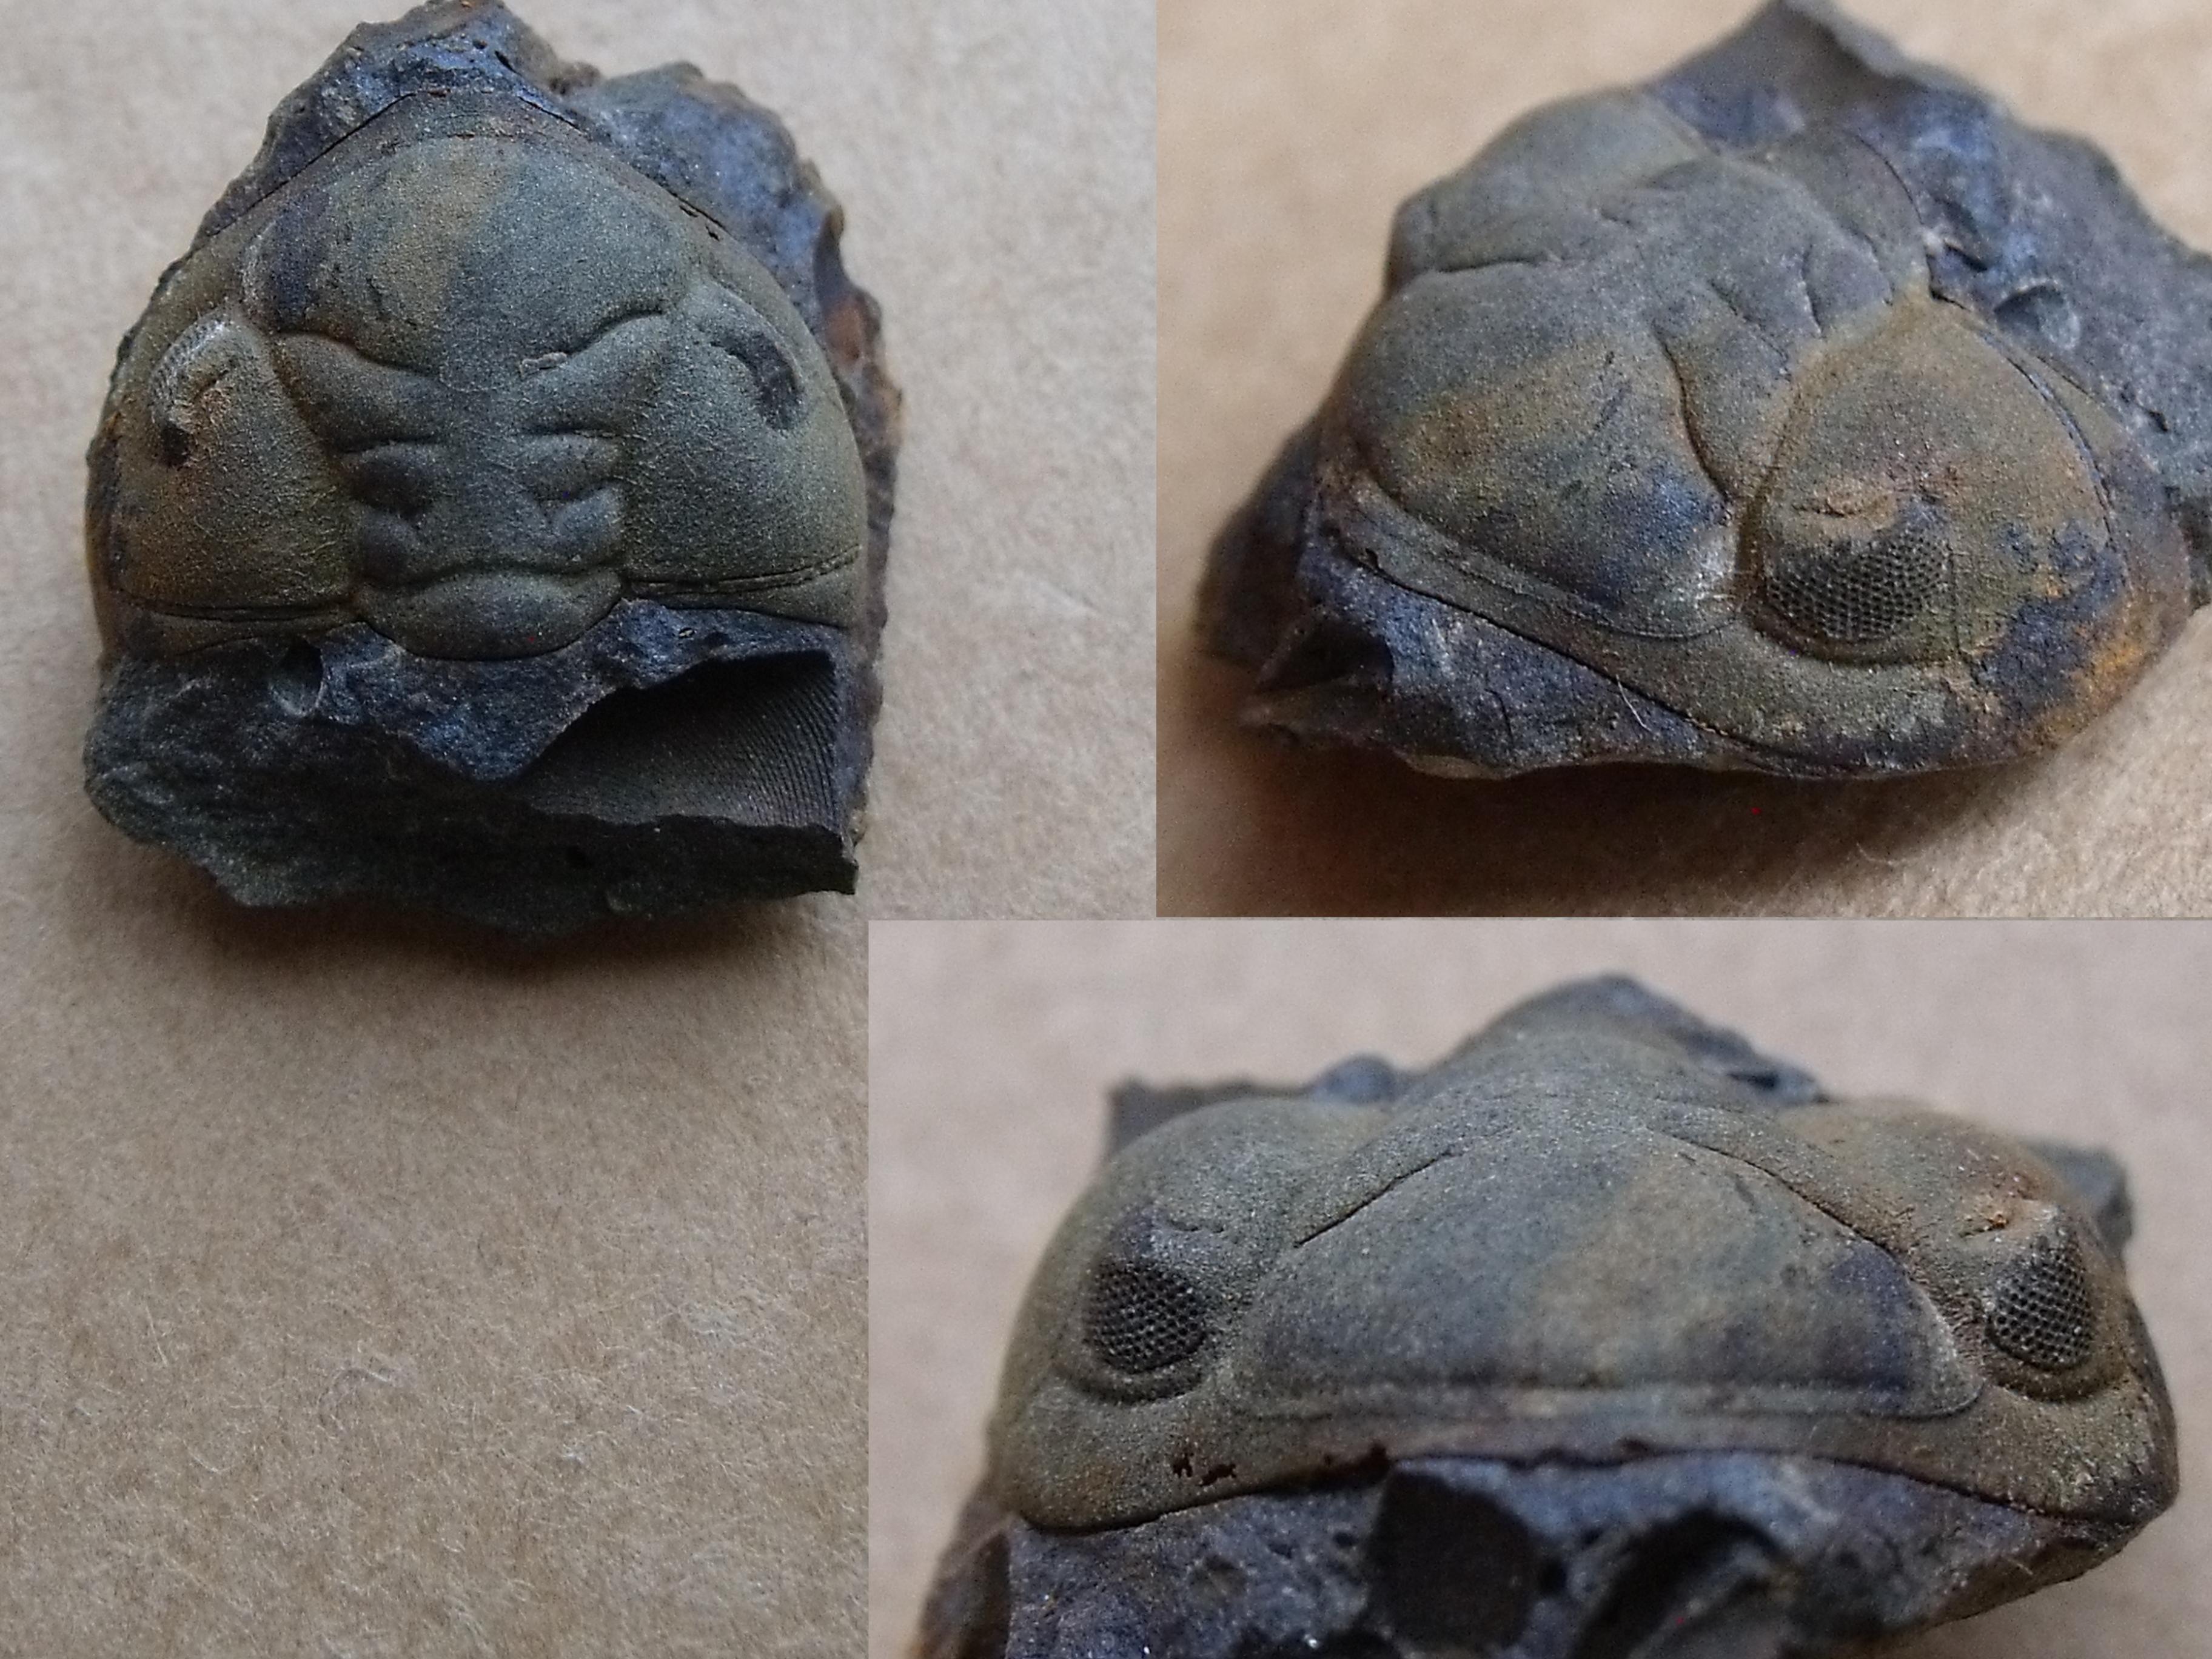 hlava trilobita Ormathops atava, (lok. Těškov)